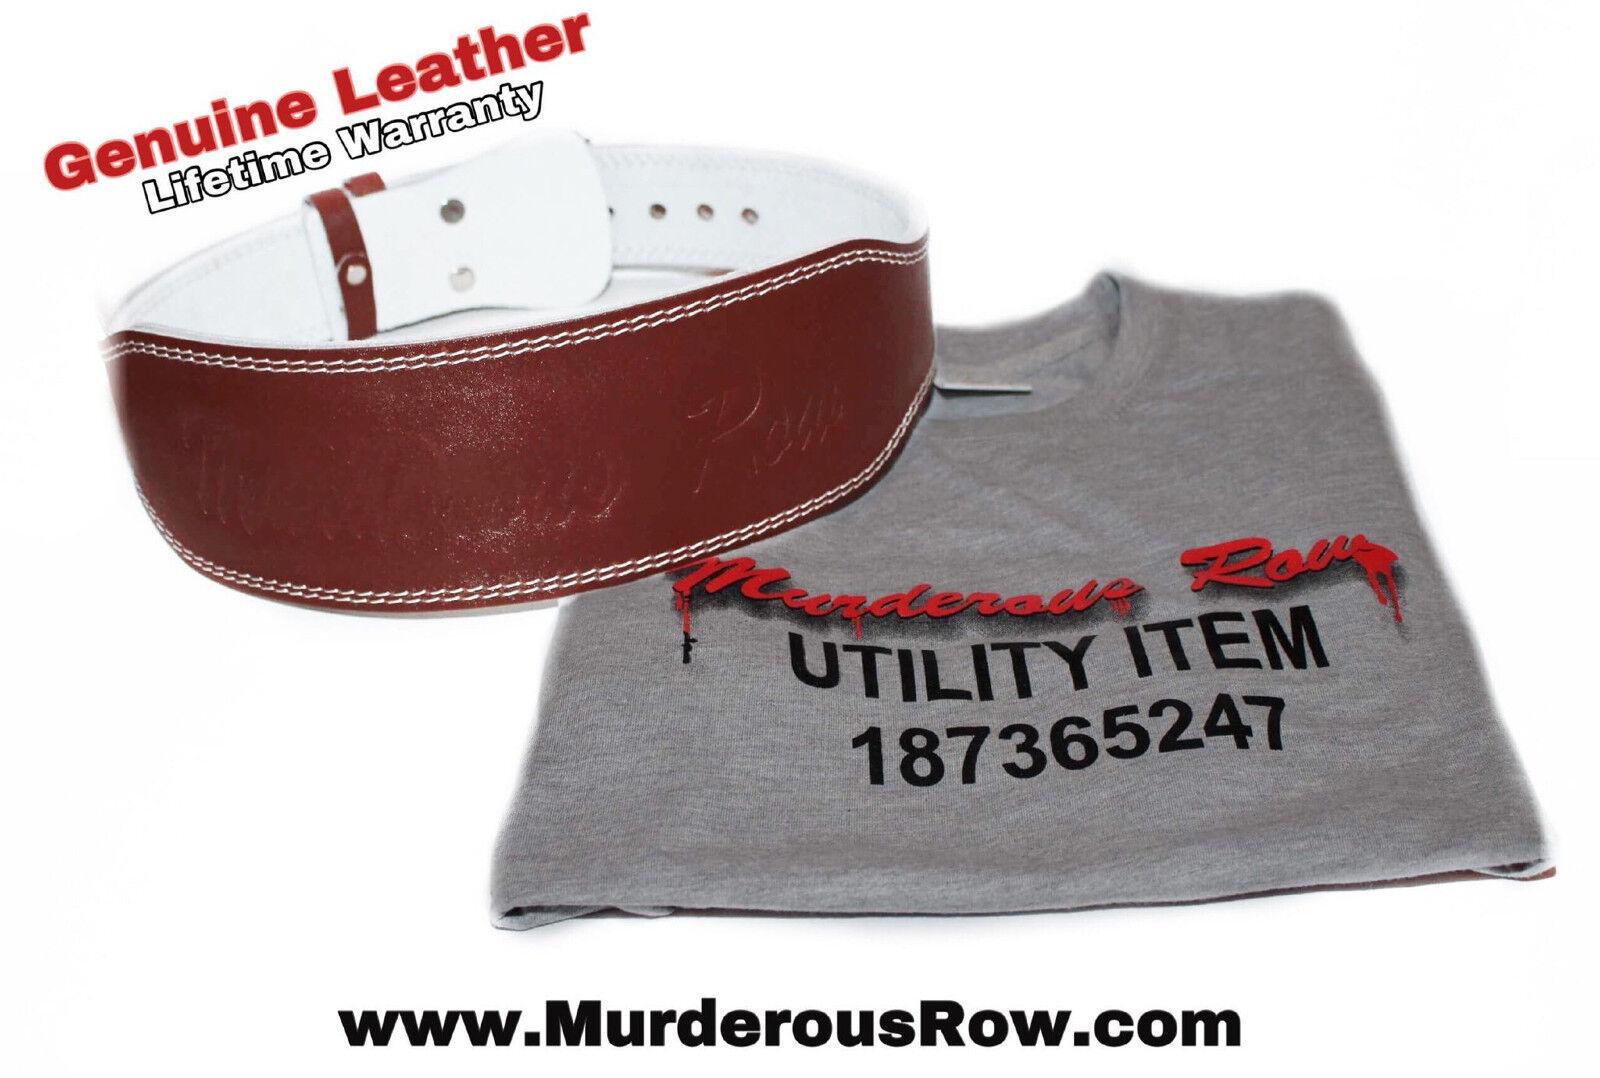 Murderous Row WeightLifting Powerlifting Genuine Leather Belt  (L) - BONUS SHIRT   hottest new styles